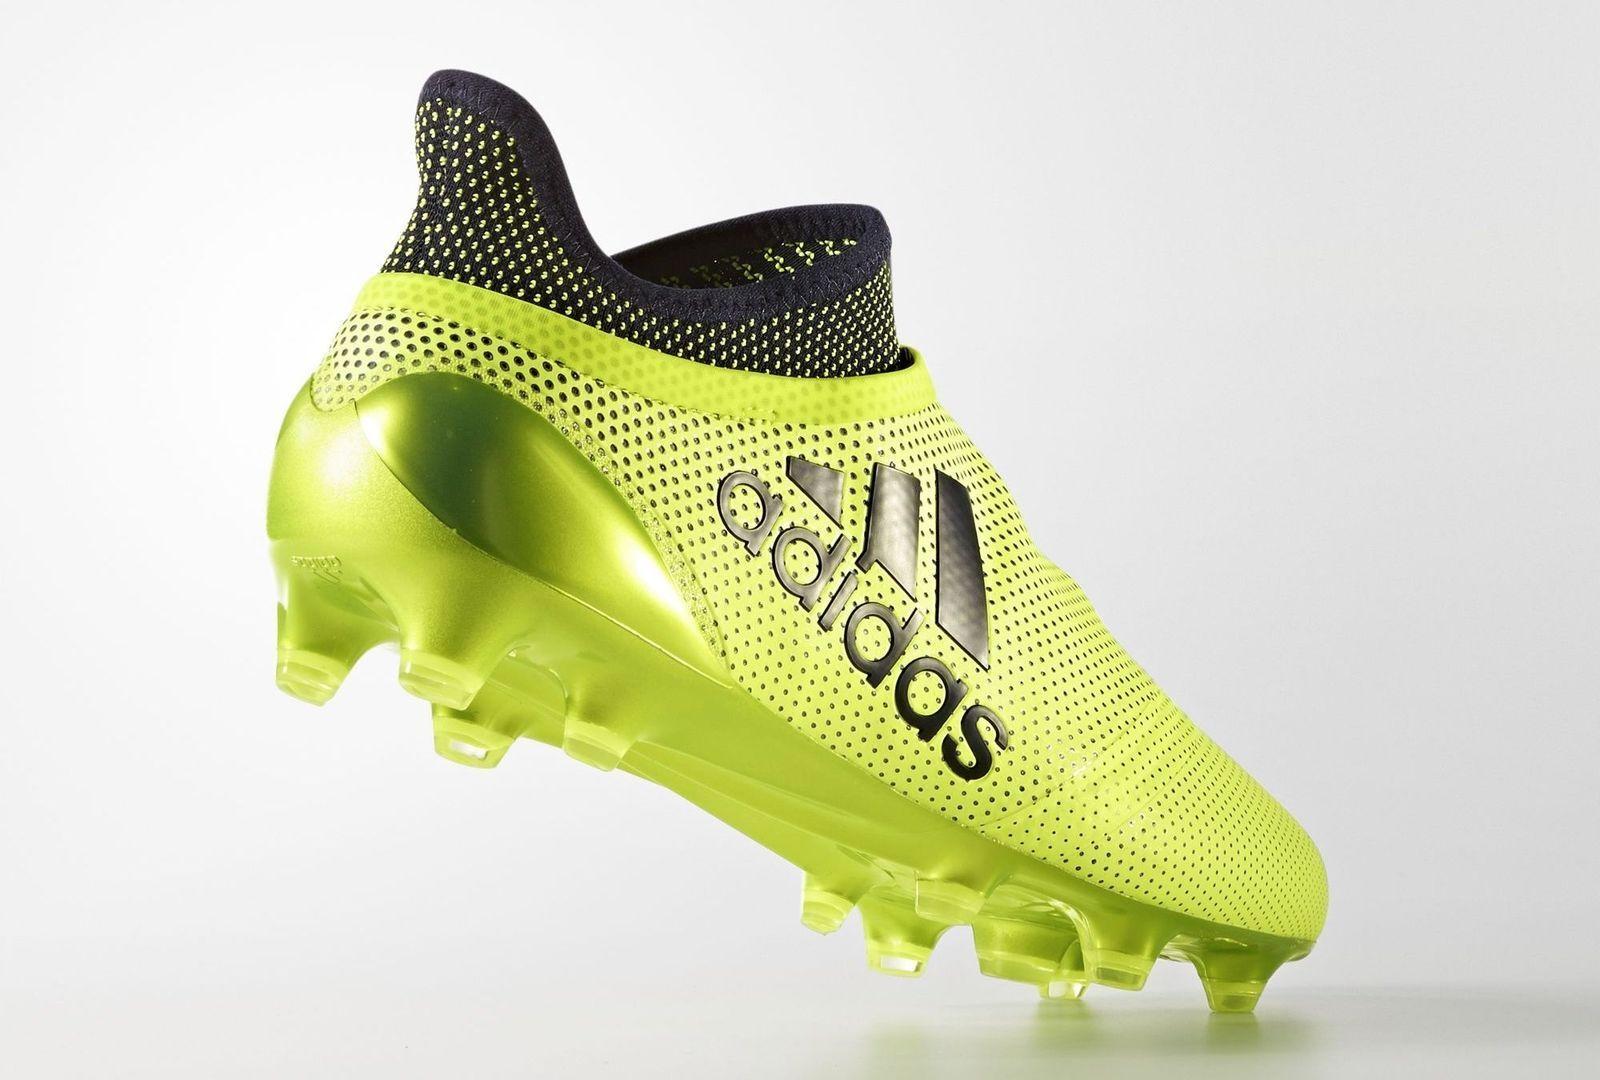 Adidas Men's X 17+ Purespeed FG Soccer Football Shoes Cleats Boots  Size 12  NIB